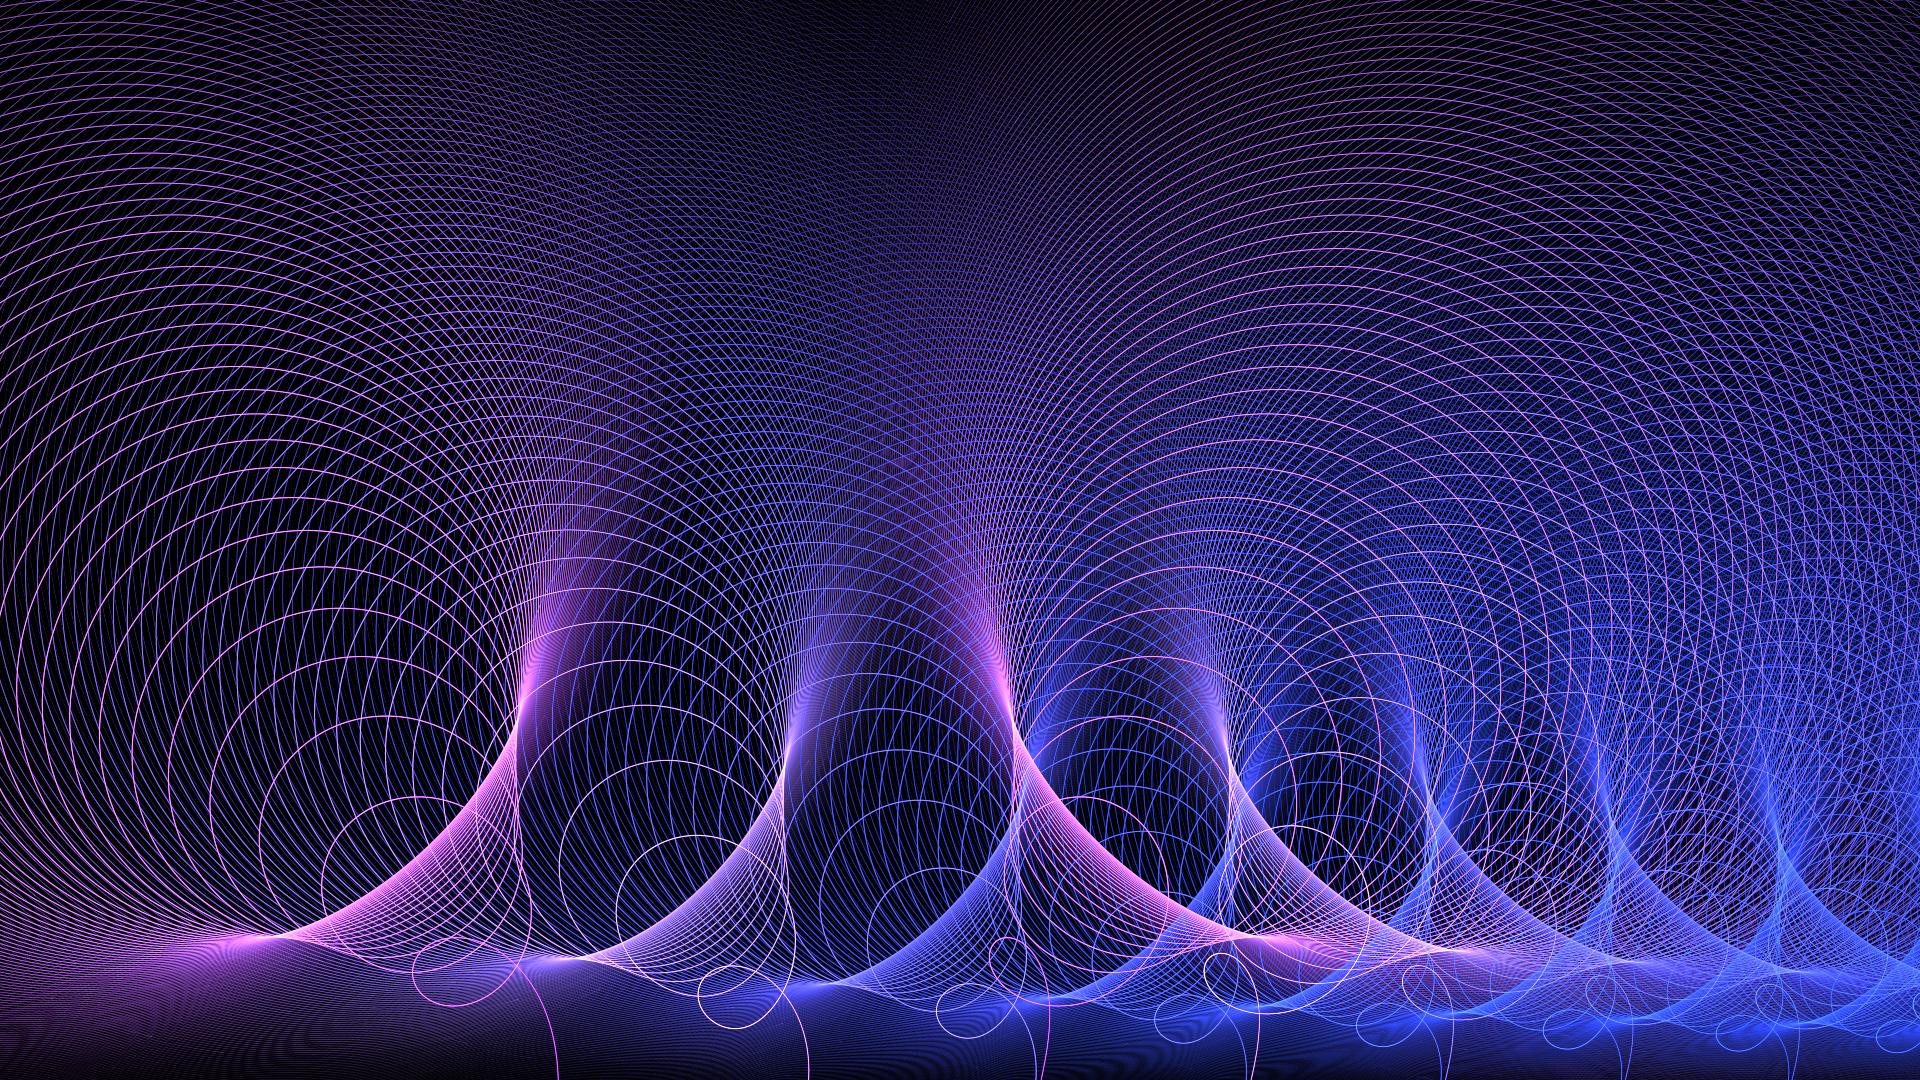 Artistic Digital Art Energy Fractal Purple Science Wave 1920x1080